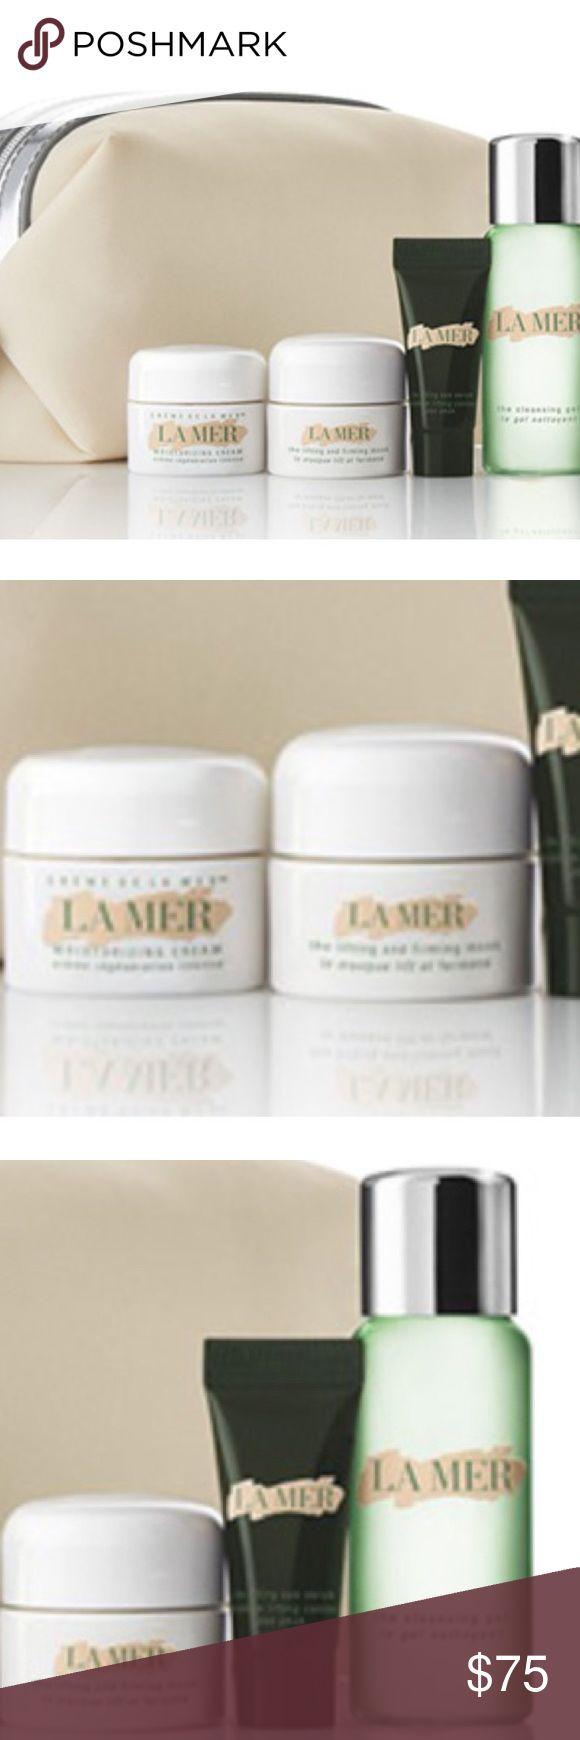 La mer 5 piece beauty bundle NET a cosmetics bag and deluxe samples of Crème de la Mer Moisturizing Cream (0.24 oz.), The Lifting & Firming Mask (0.24 oz.), The Lifting Eye Serum (0.1 oz.) and The Cleansing Gel (1 oz.) w La Mer Makeup